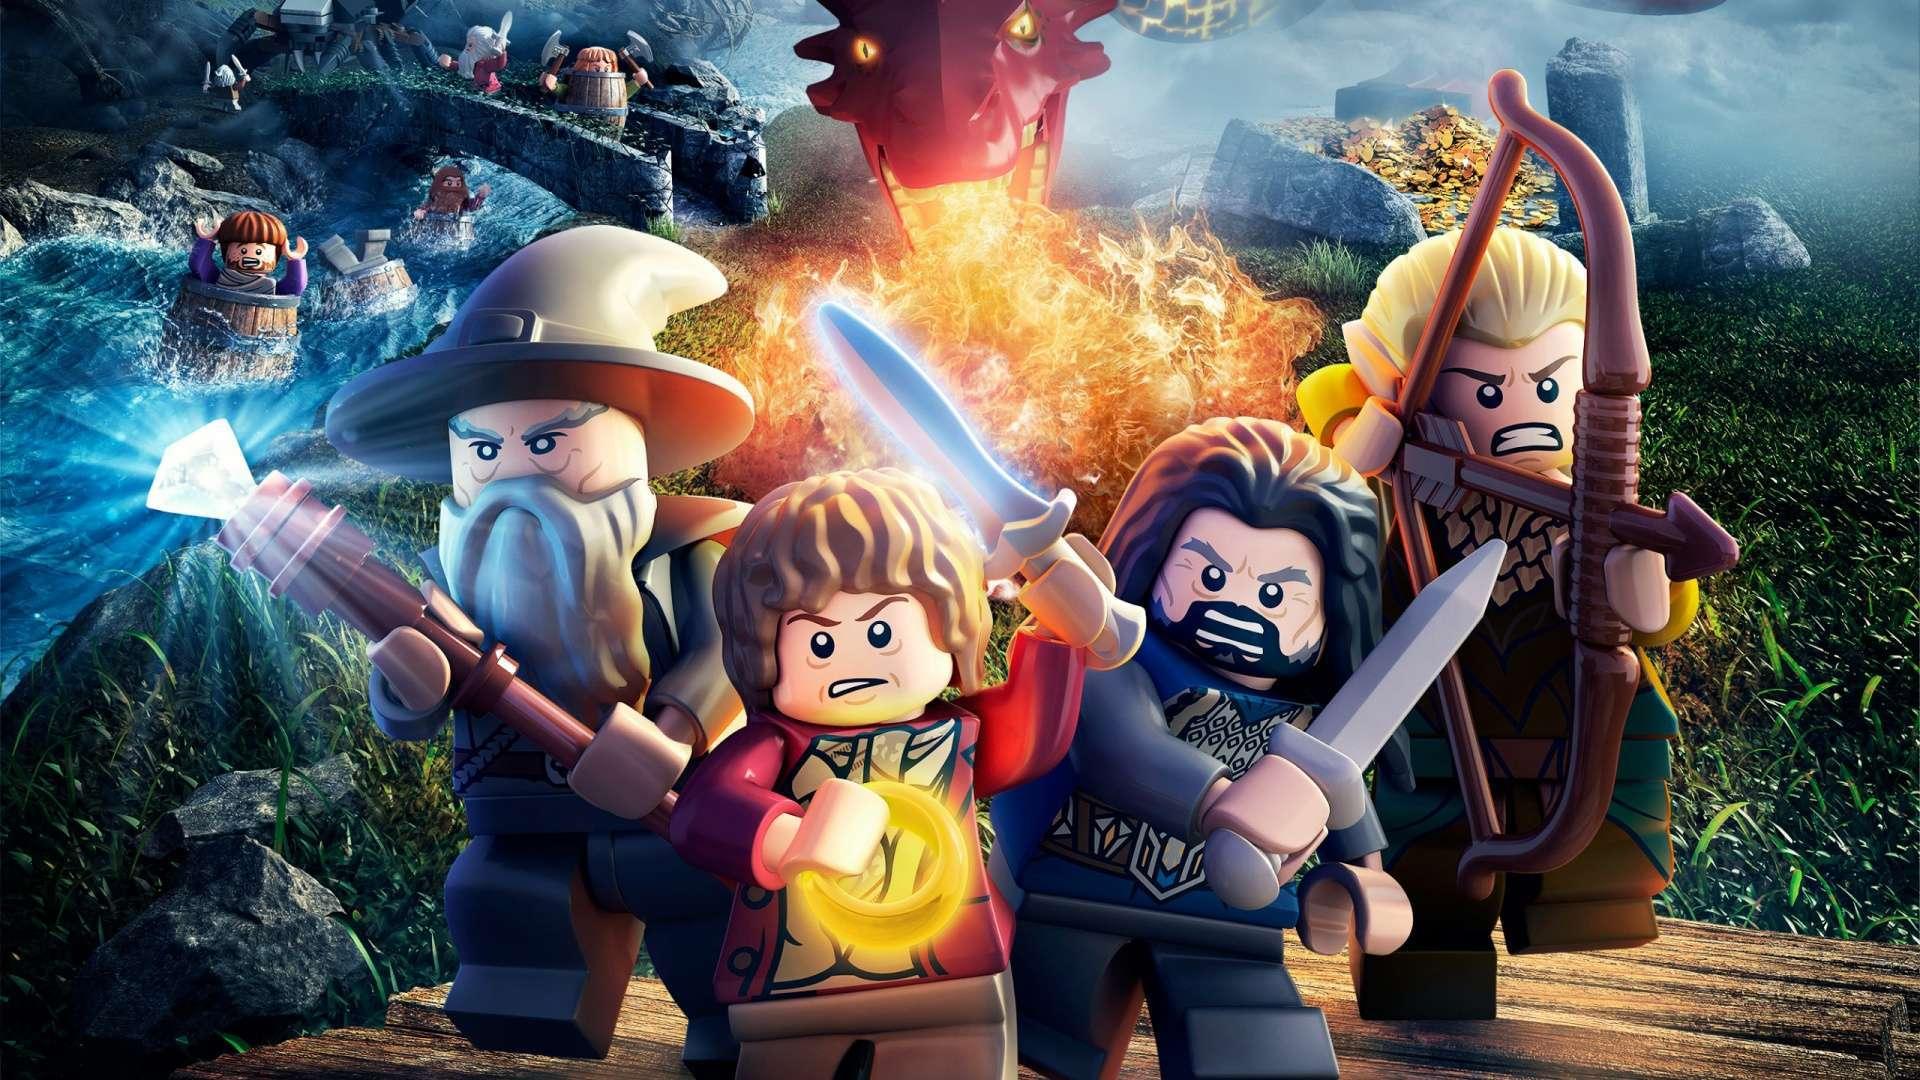 Download Lego The Hobbit Game HD Wallpaper 1080p HDWallWidecom 1920x1080